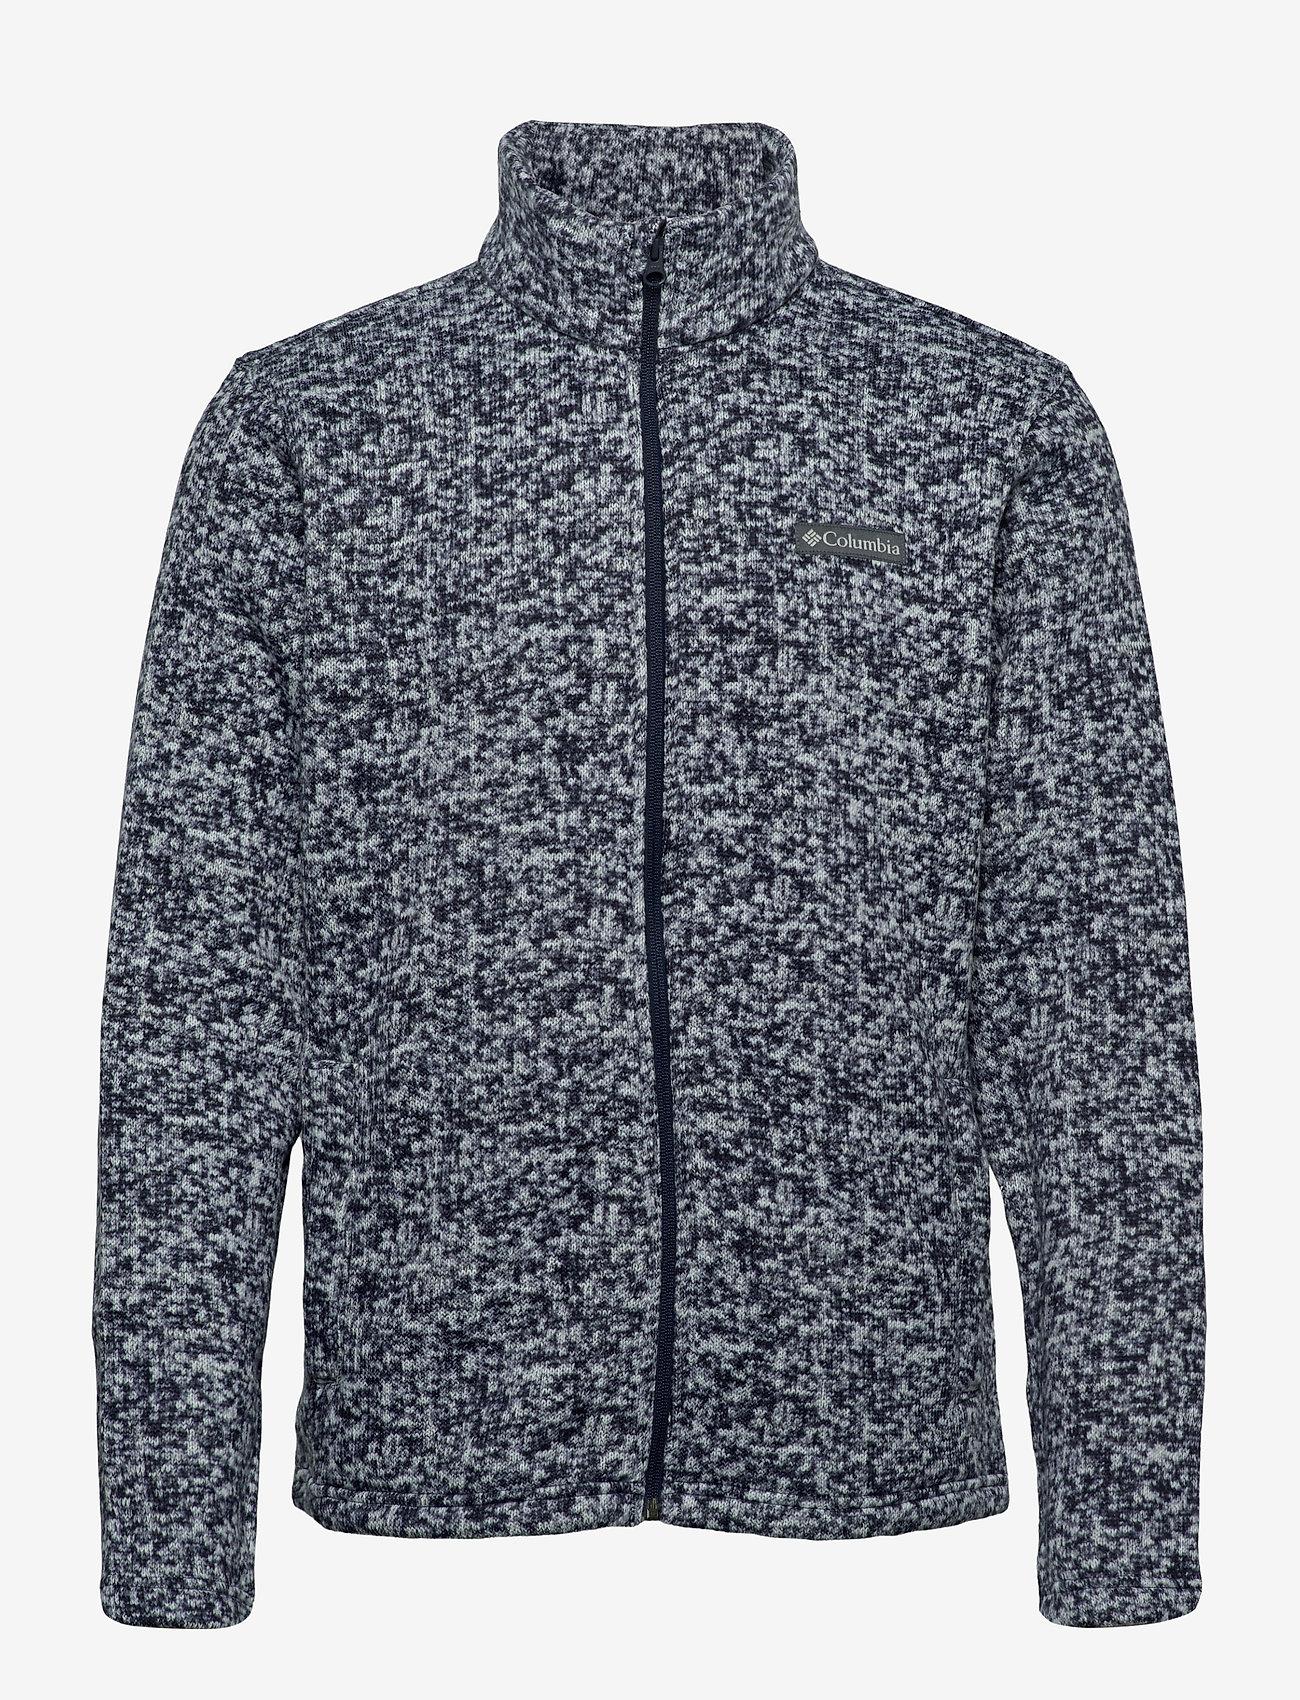 Columbia - M Chillin Fleece - mid layer jackets - collegiate navy scatter - 0